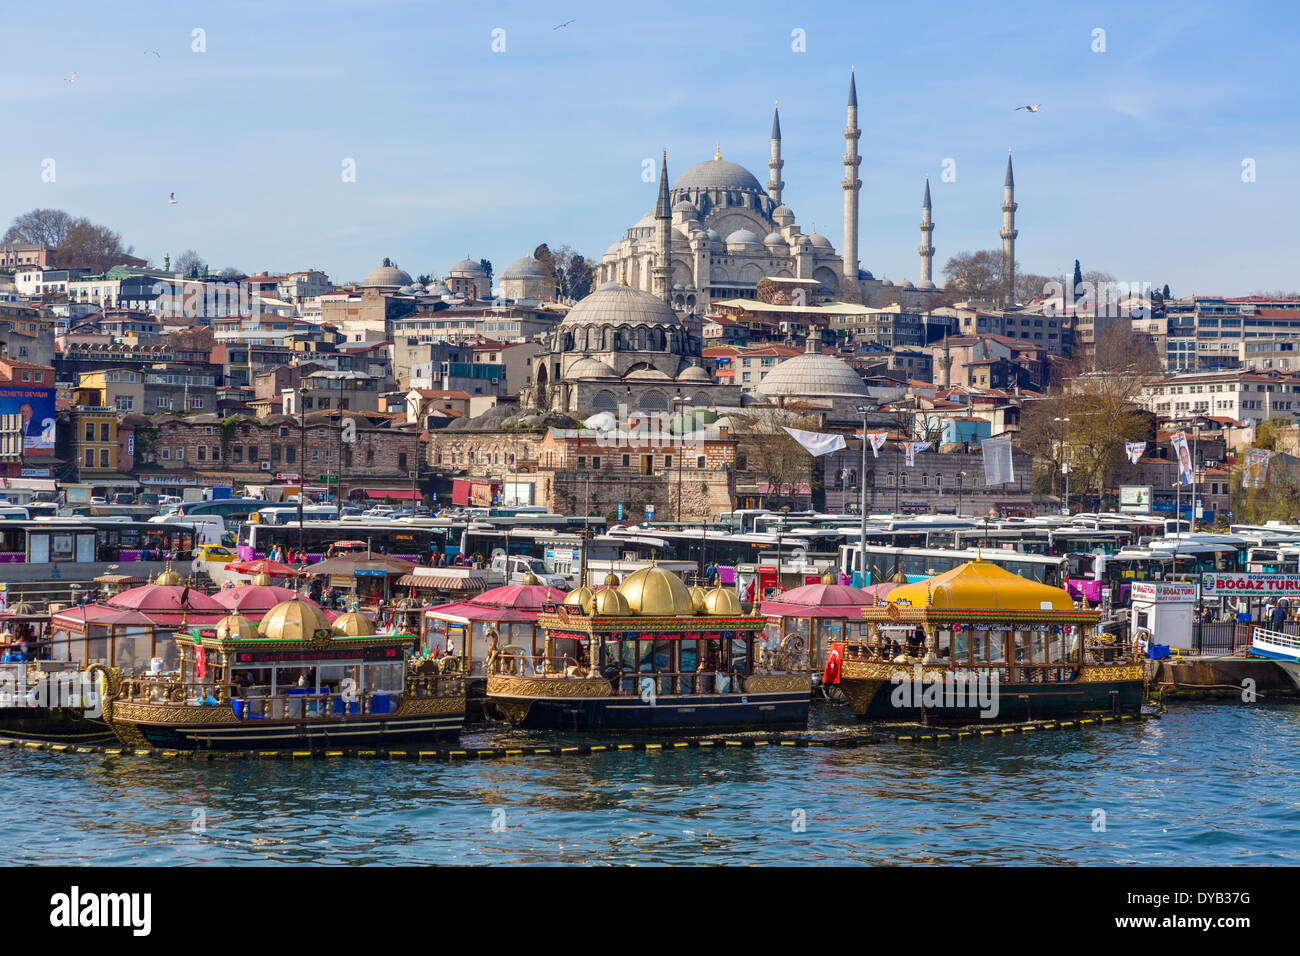 Barche decorativo di vendita del pesce panini (Tarihi Eminonu Balik Ekmek) con la Moschea di Suleymaniye dietro, Eminonu, Istanbul, Turchia Immagini Stock